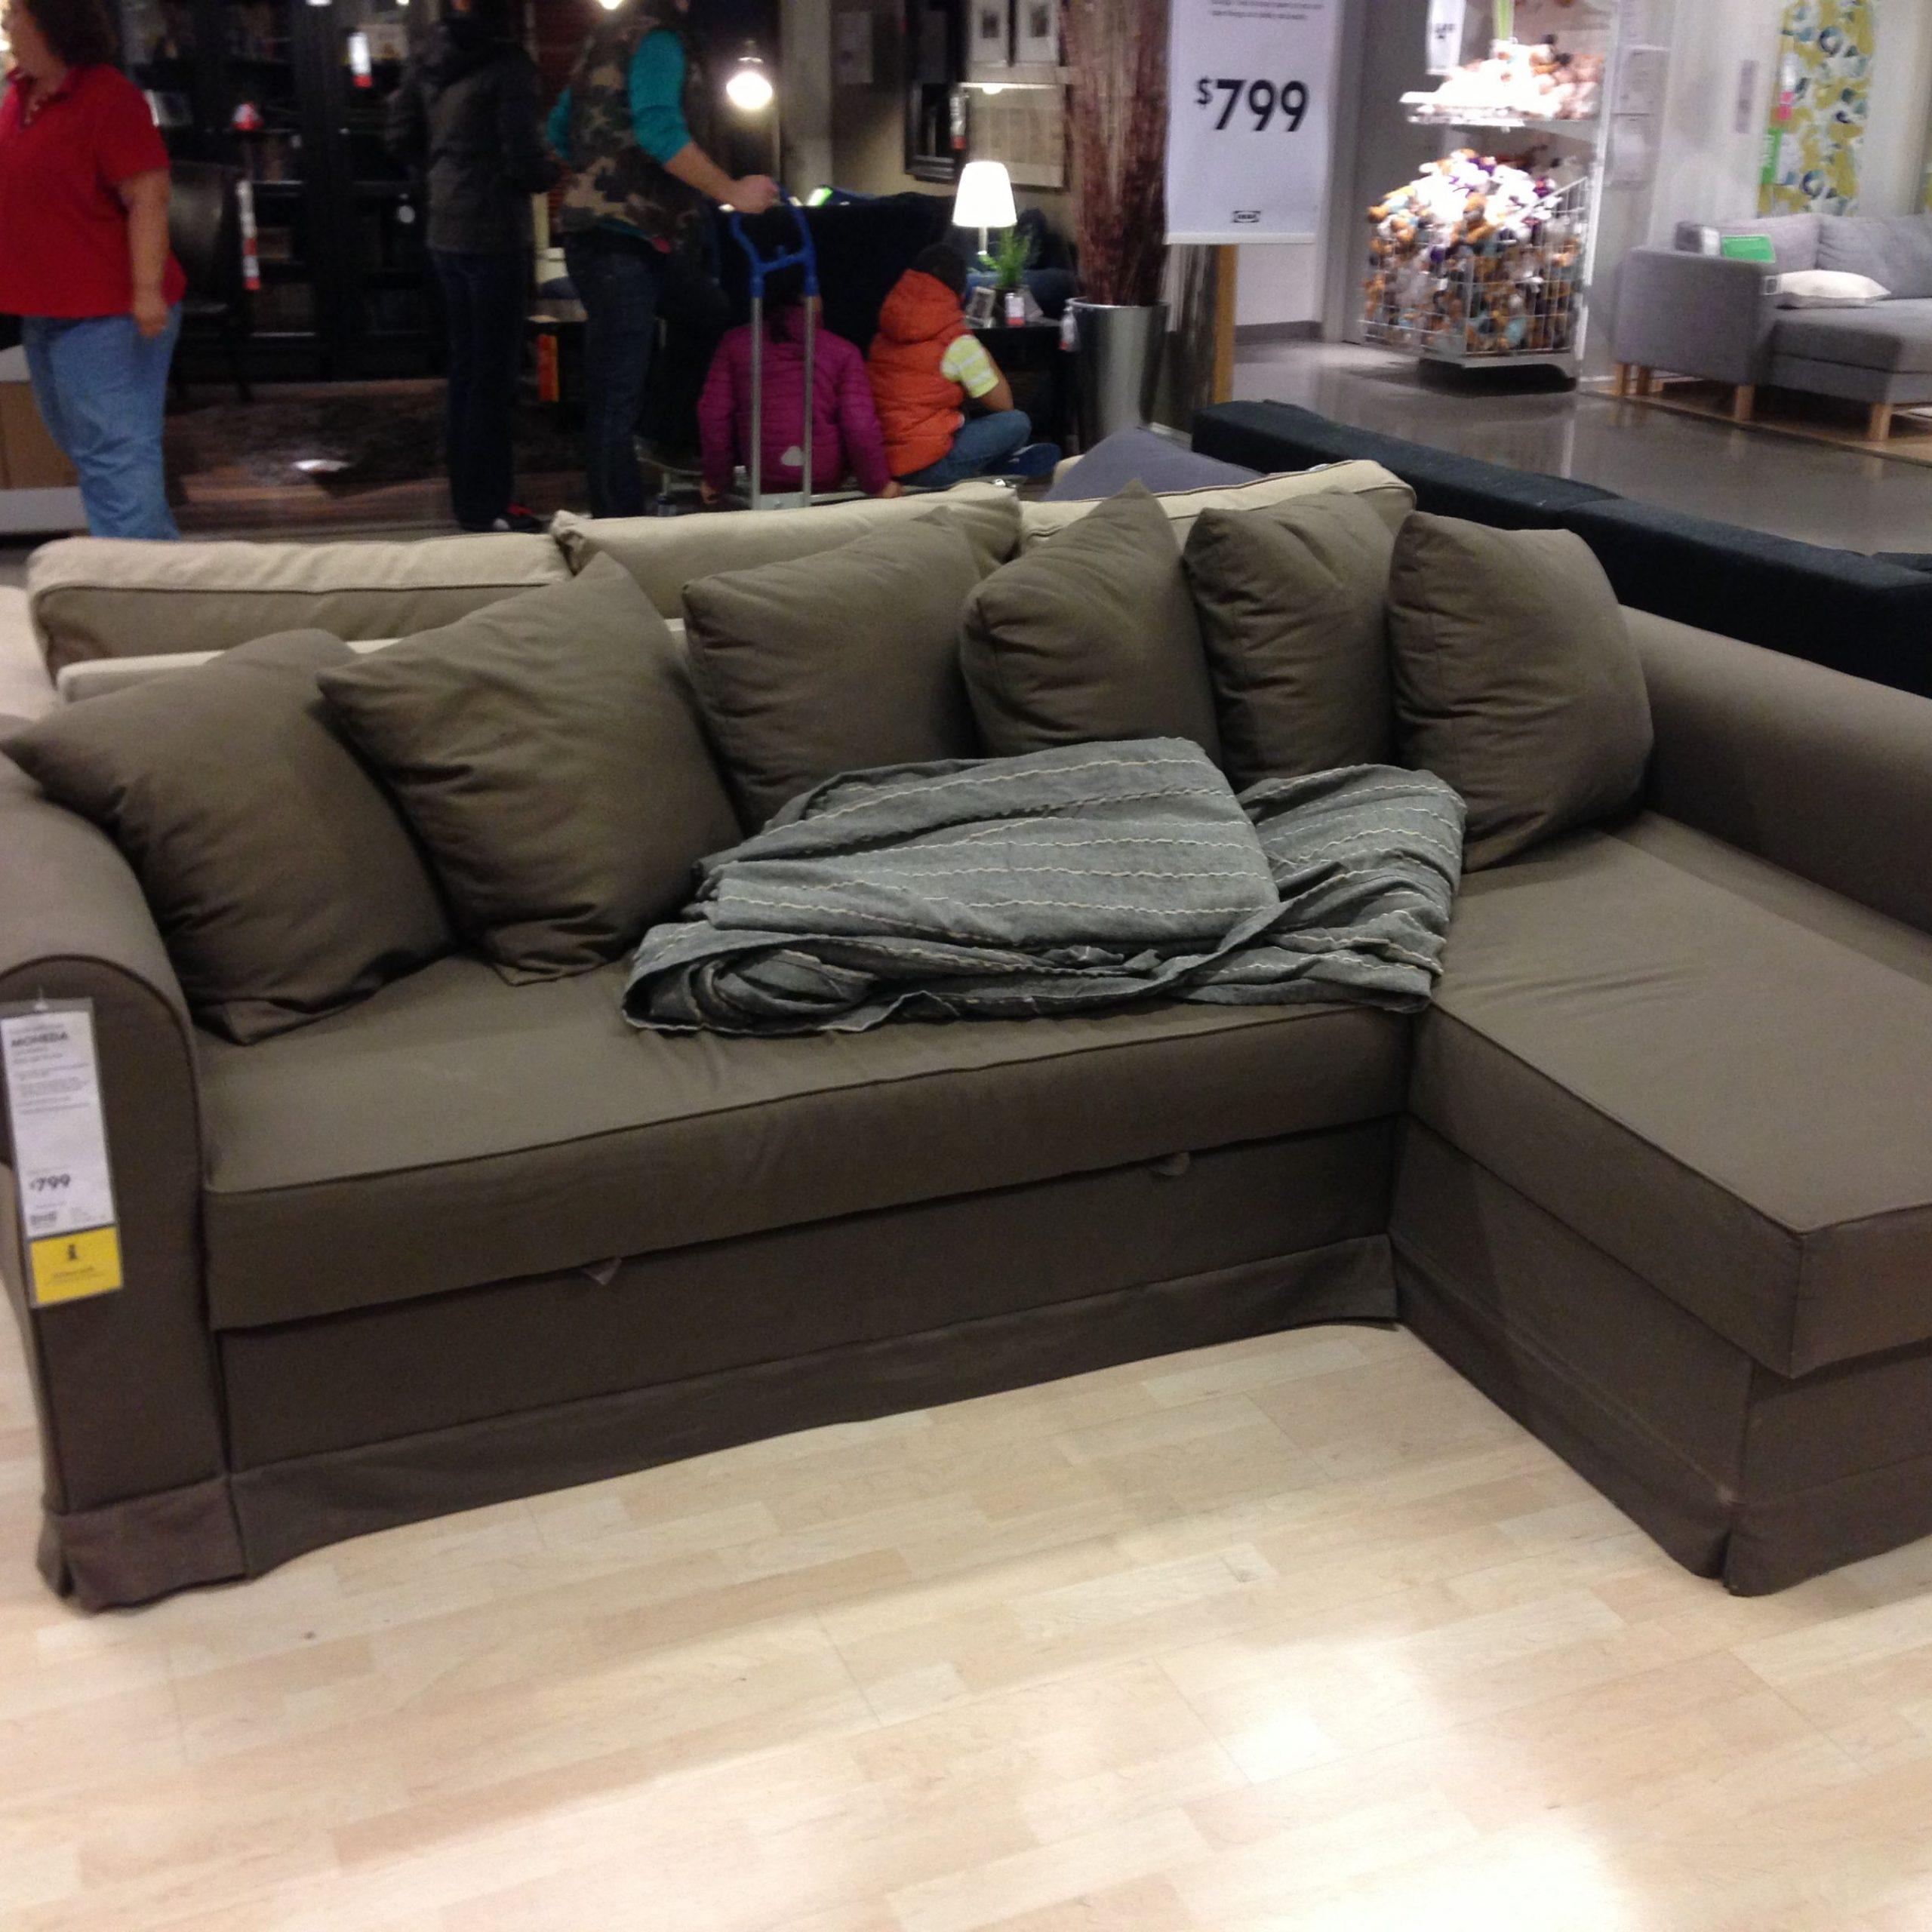 Ikea Moheda Corner Sofa Bed With Storage | Ikea Sofa Bed Pertaining To Ikea Corner Sofas With Storage (View 1 of 15)